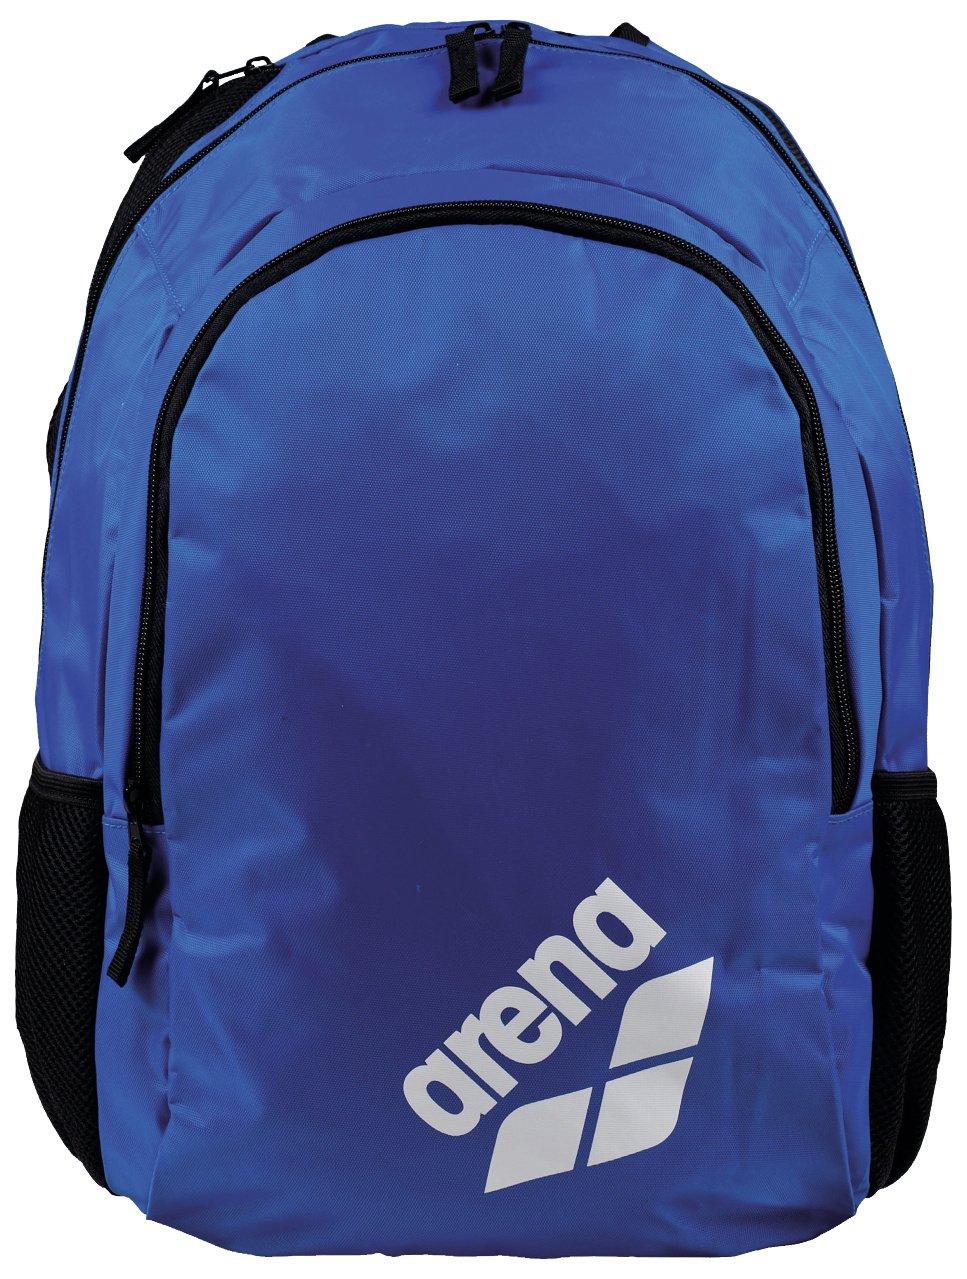 arena Spiky 2 Swim Backpack, Royal Team